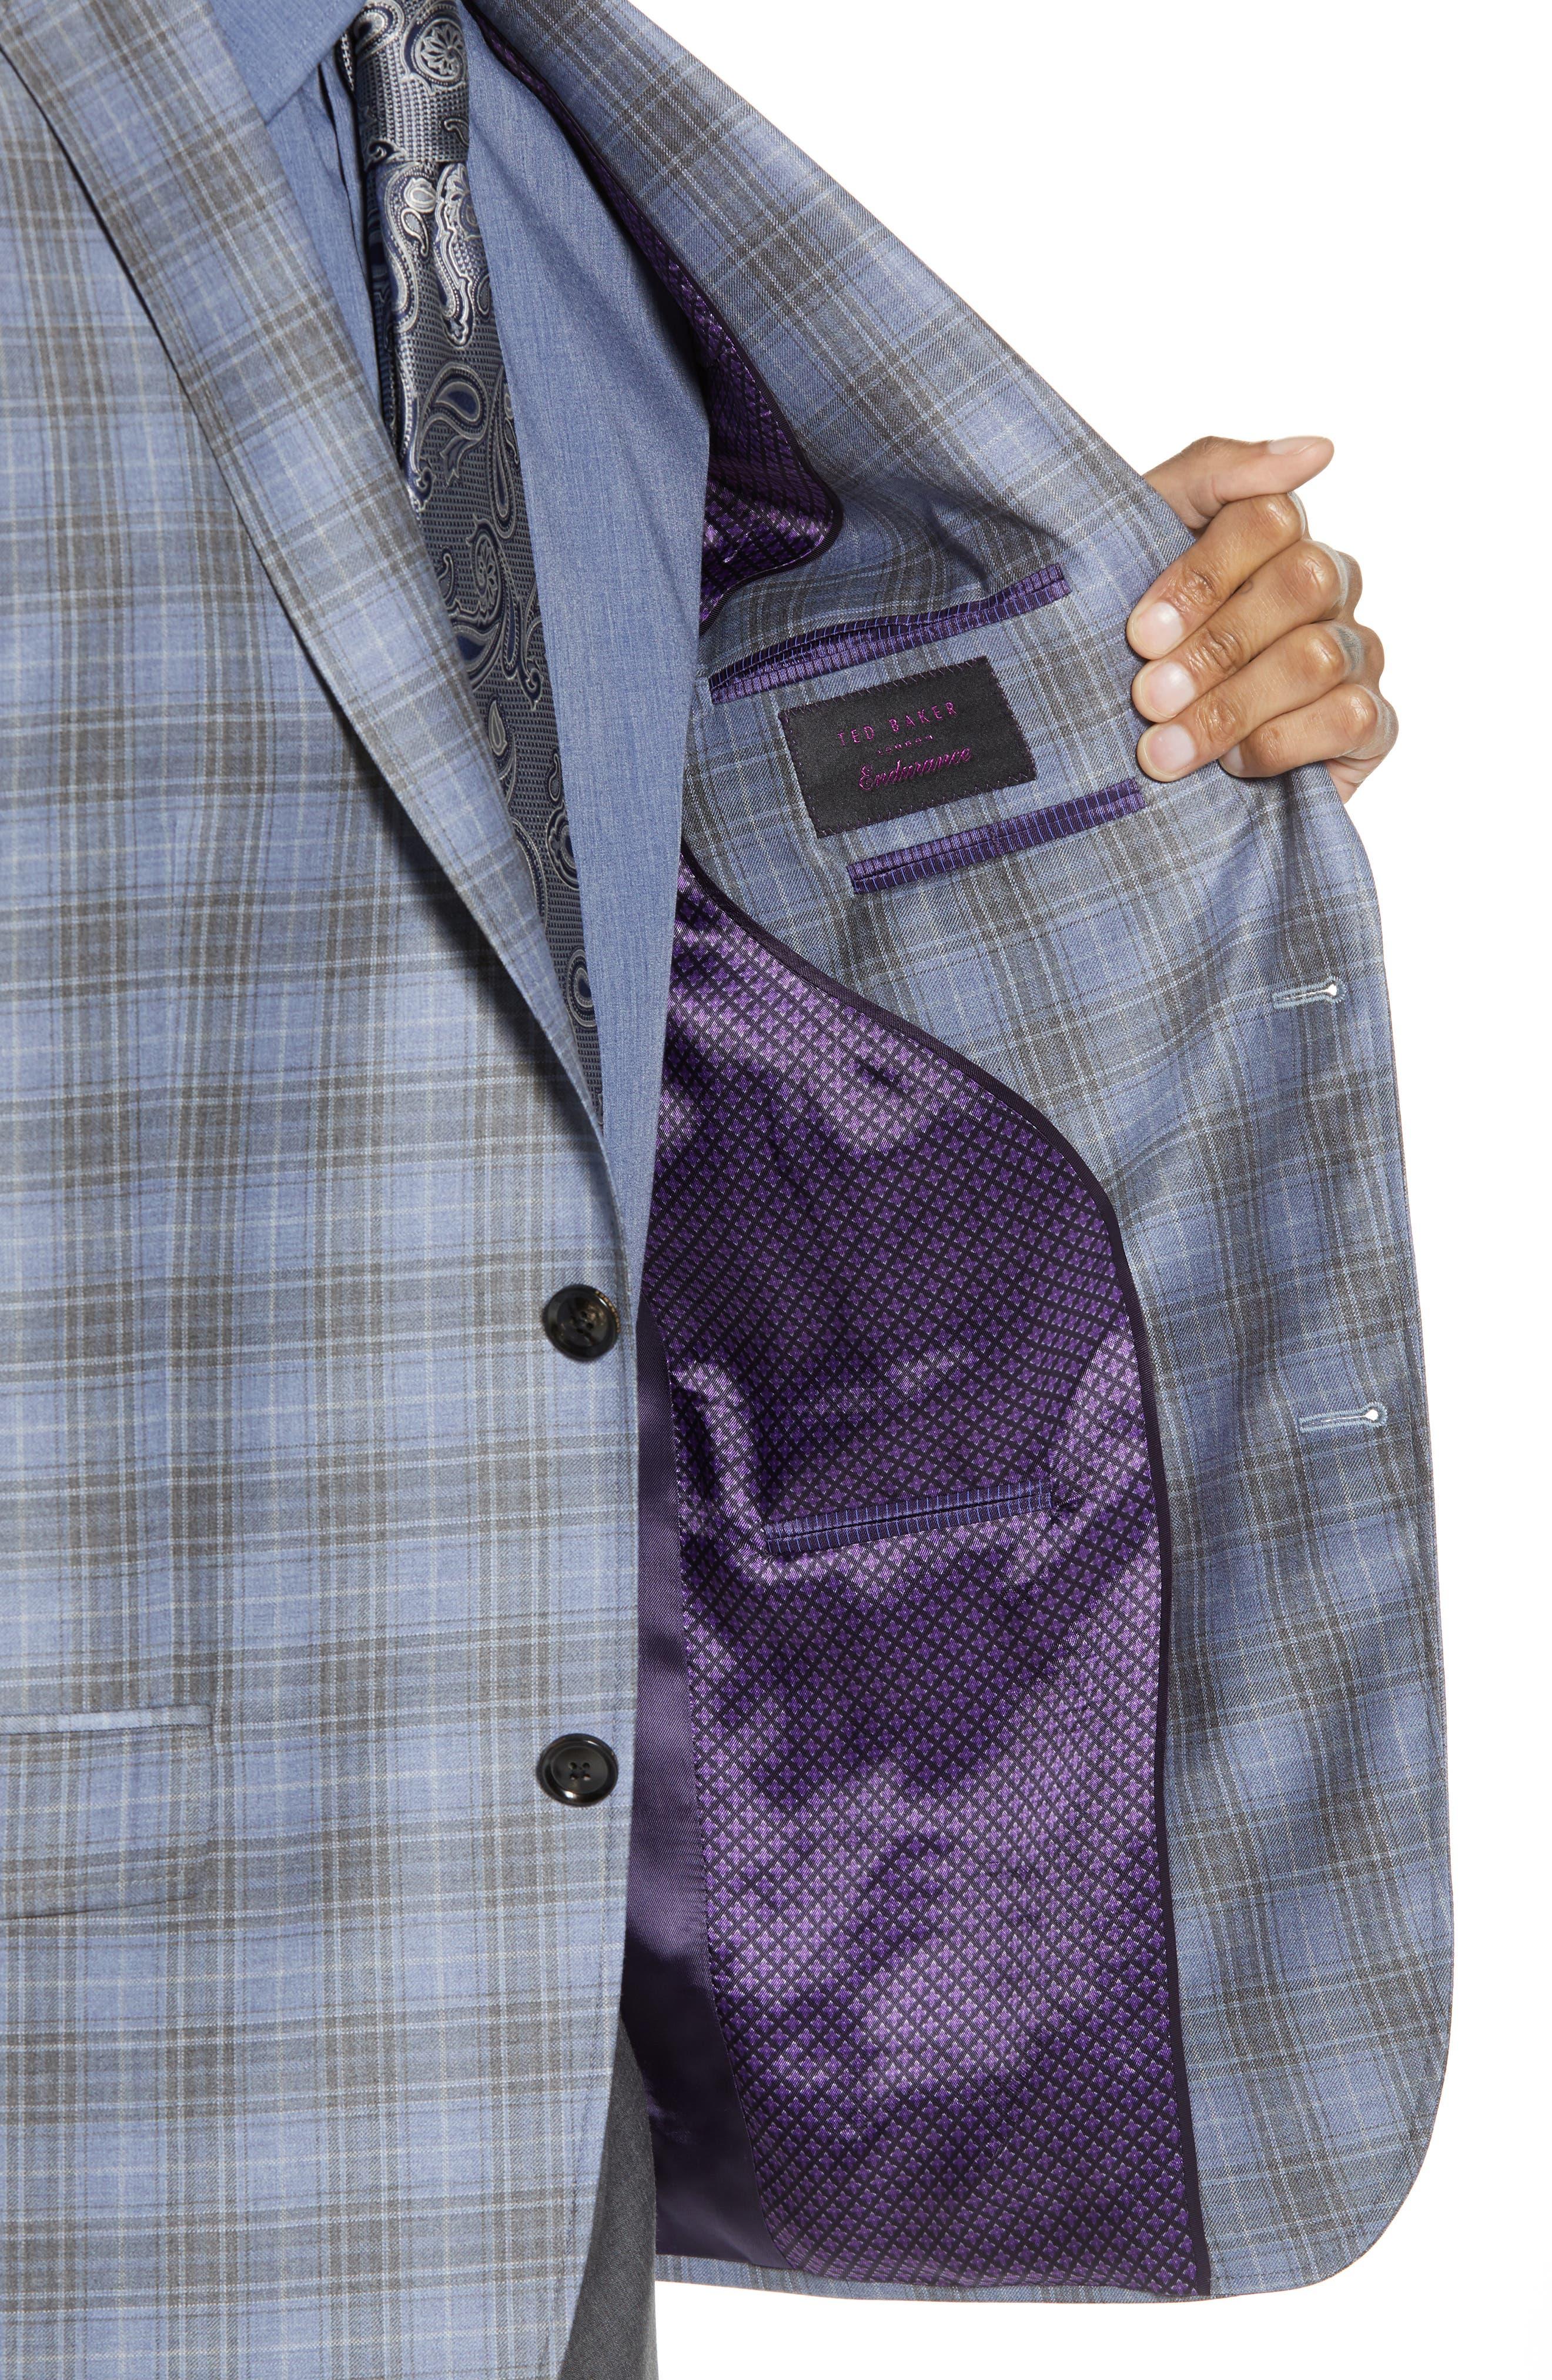 Jay Trim Fit Plaid Wool Sport Coat,                             Alternate thumbnail 4, color,                             Light Blue